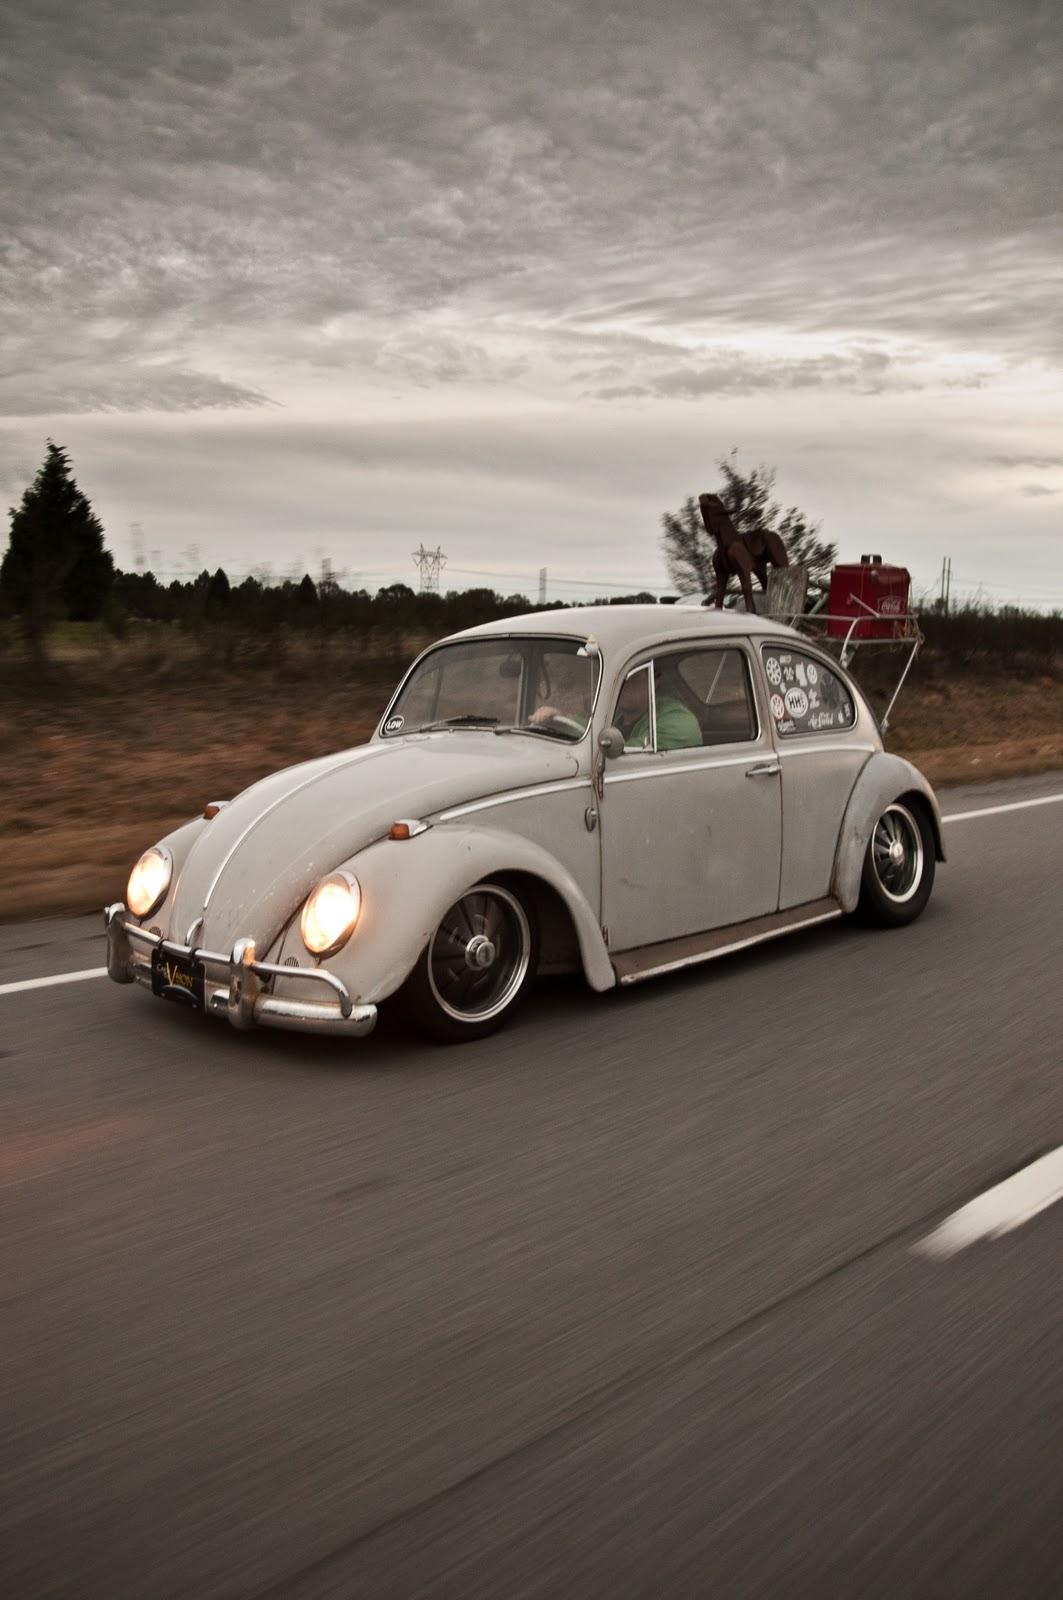 Otis - my '65 Beetle DSC_0005-6